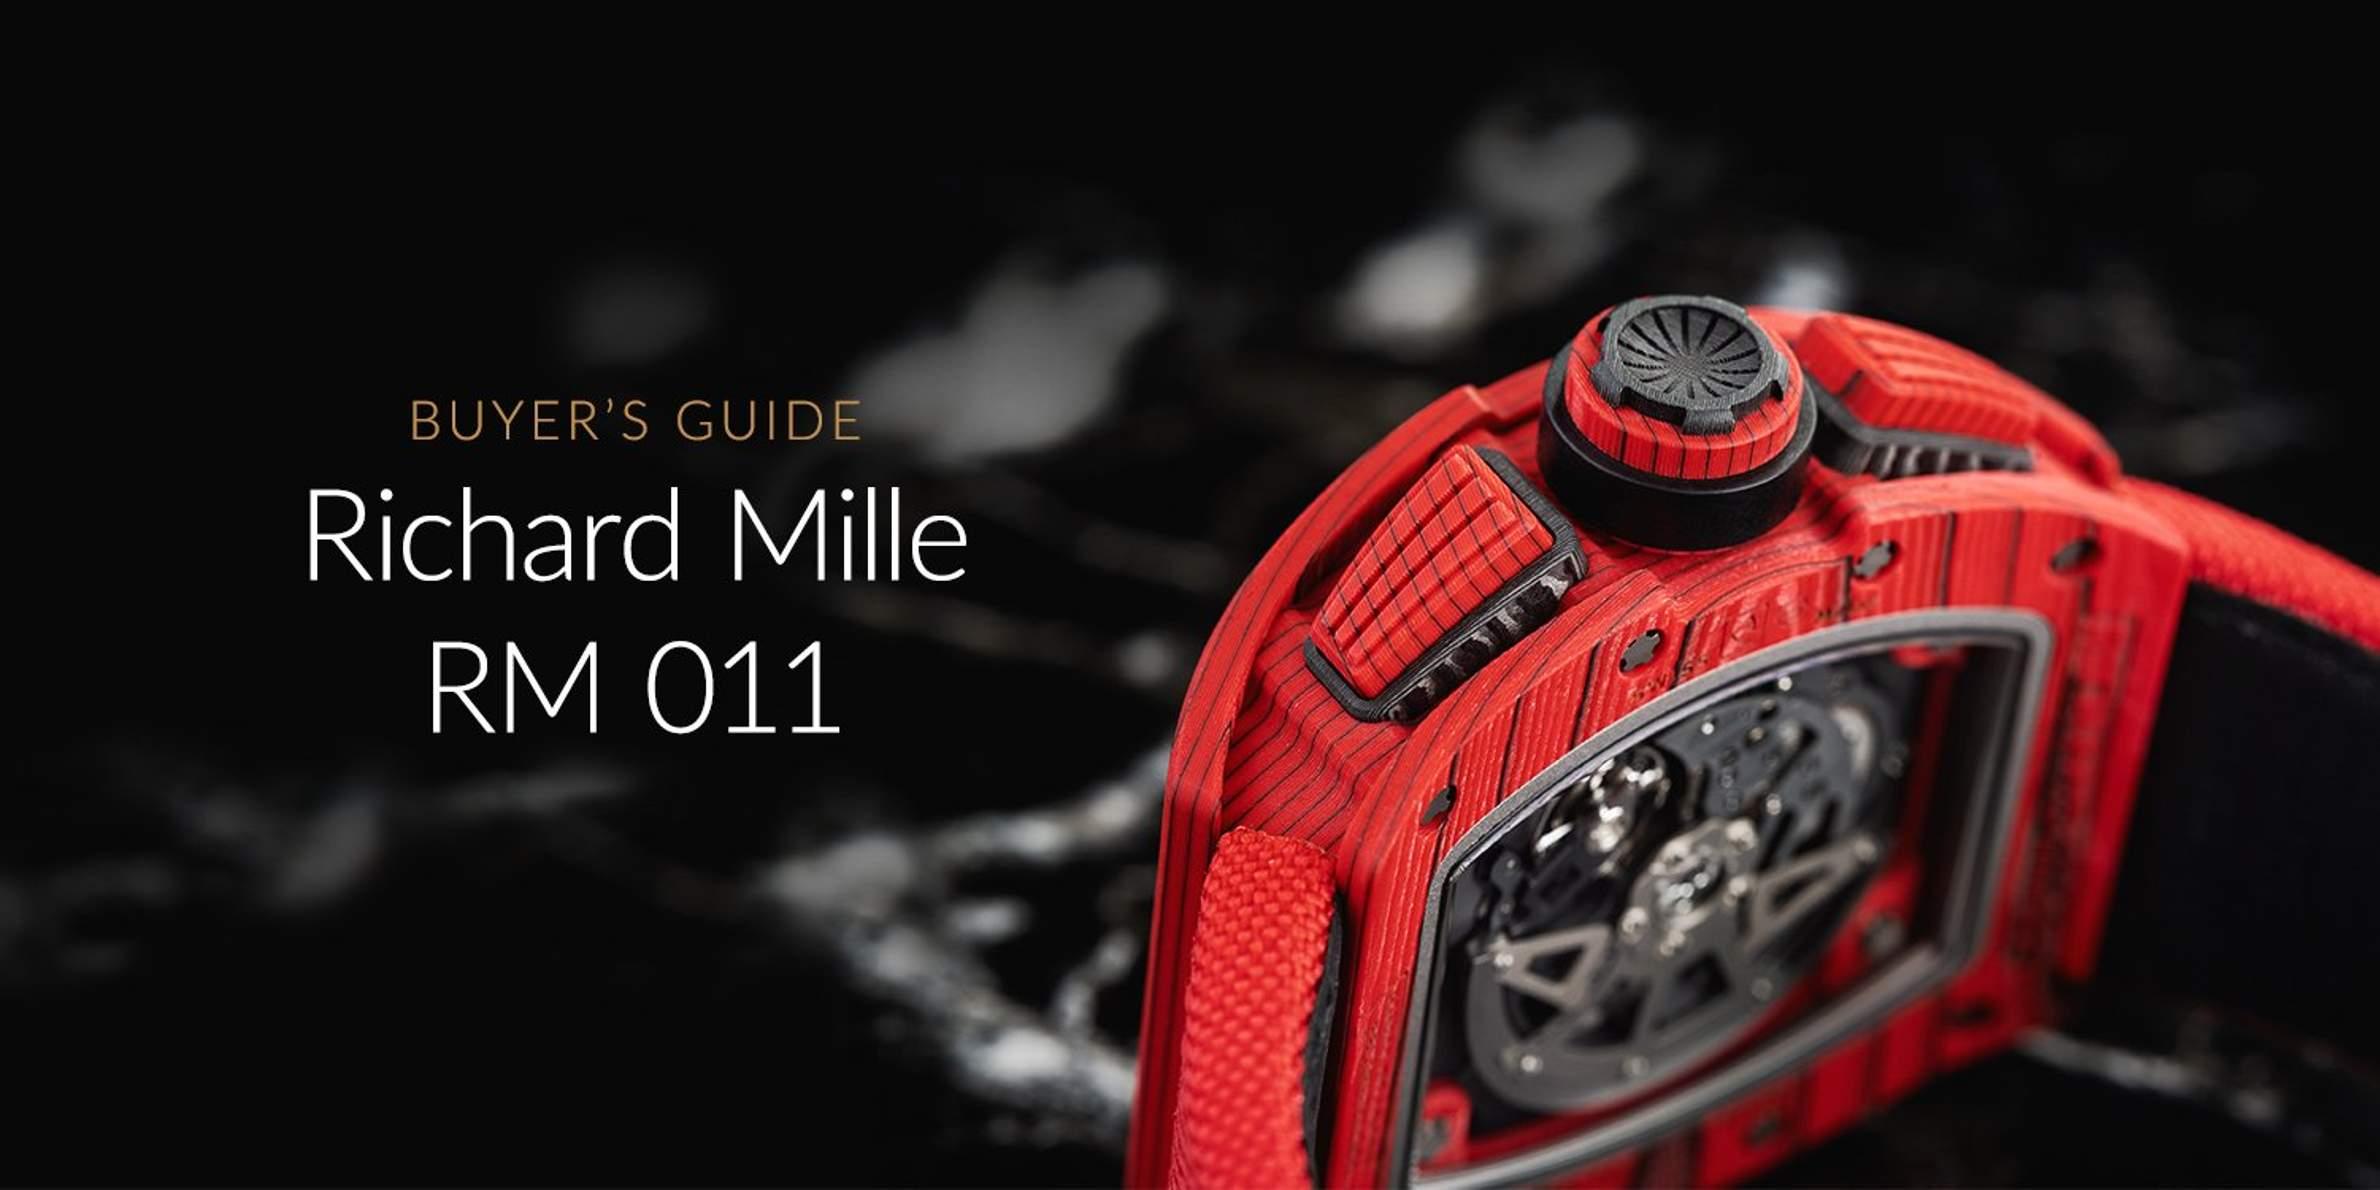 CAM-1764-Buyers-Guide-Richard-Mille-2-1-DE